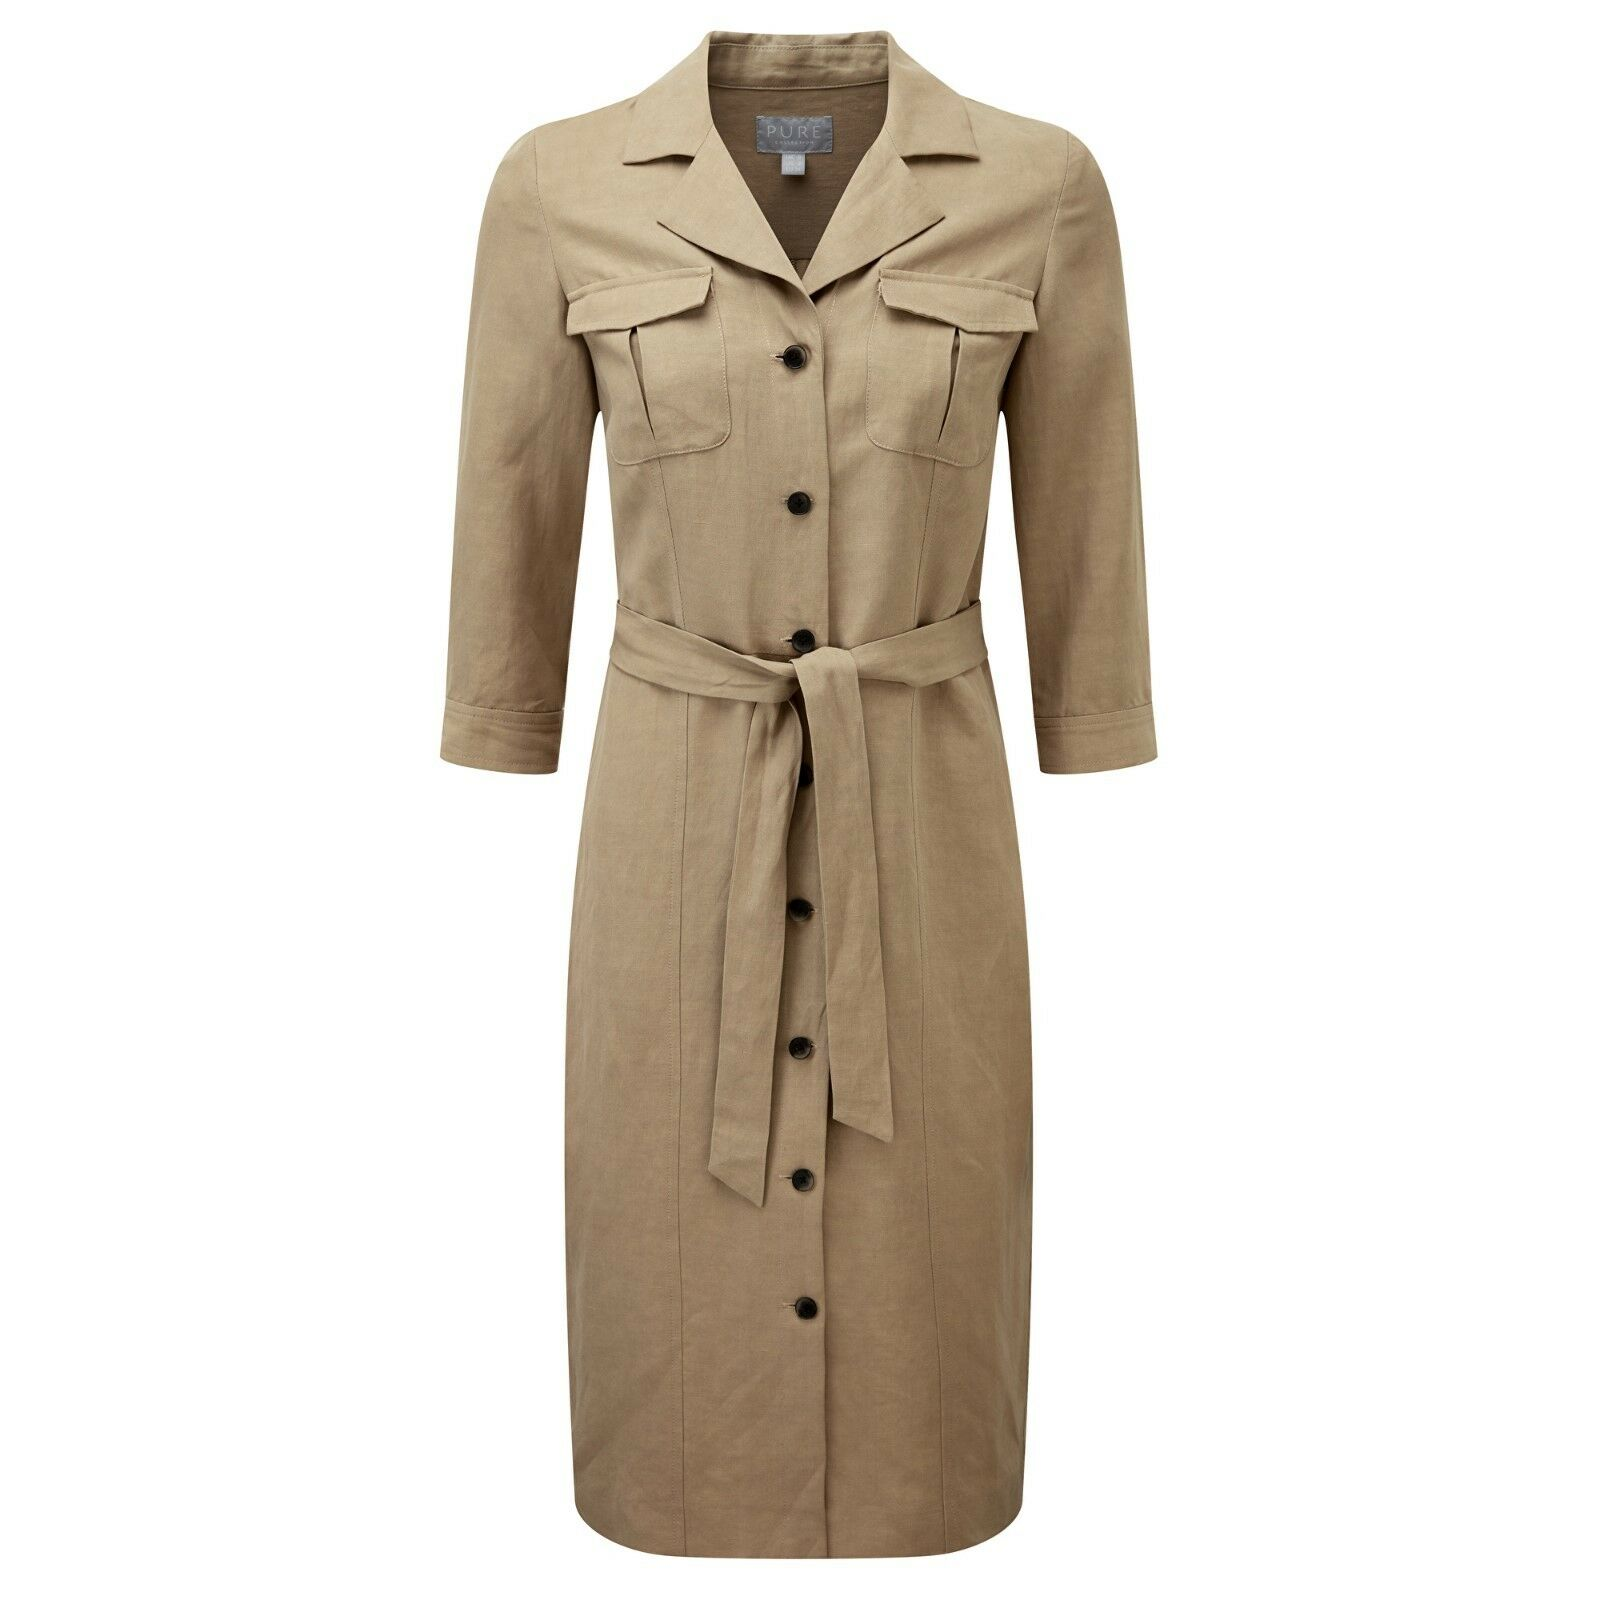 BNWT Pure Collection Silk Linen Shirt Dress - Dark Stone UK Size 10 RRP